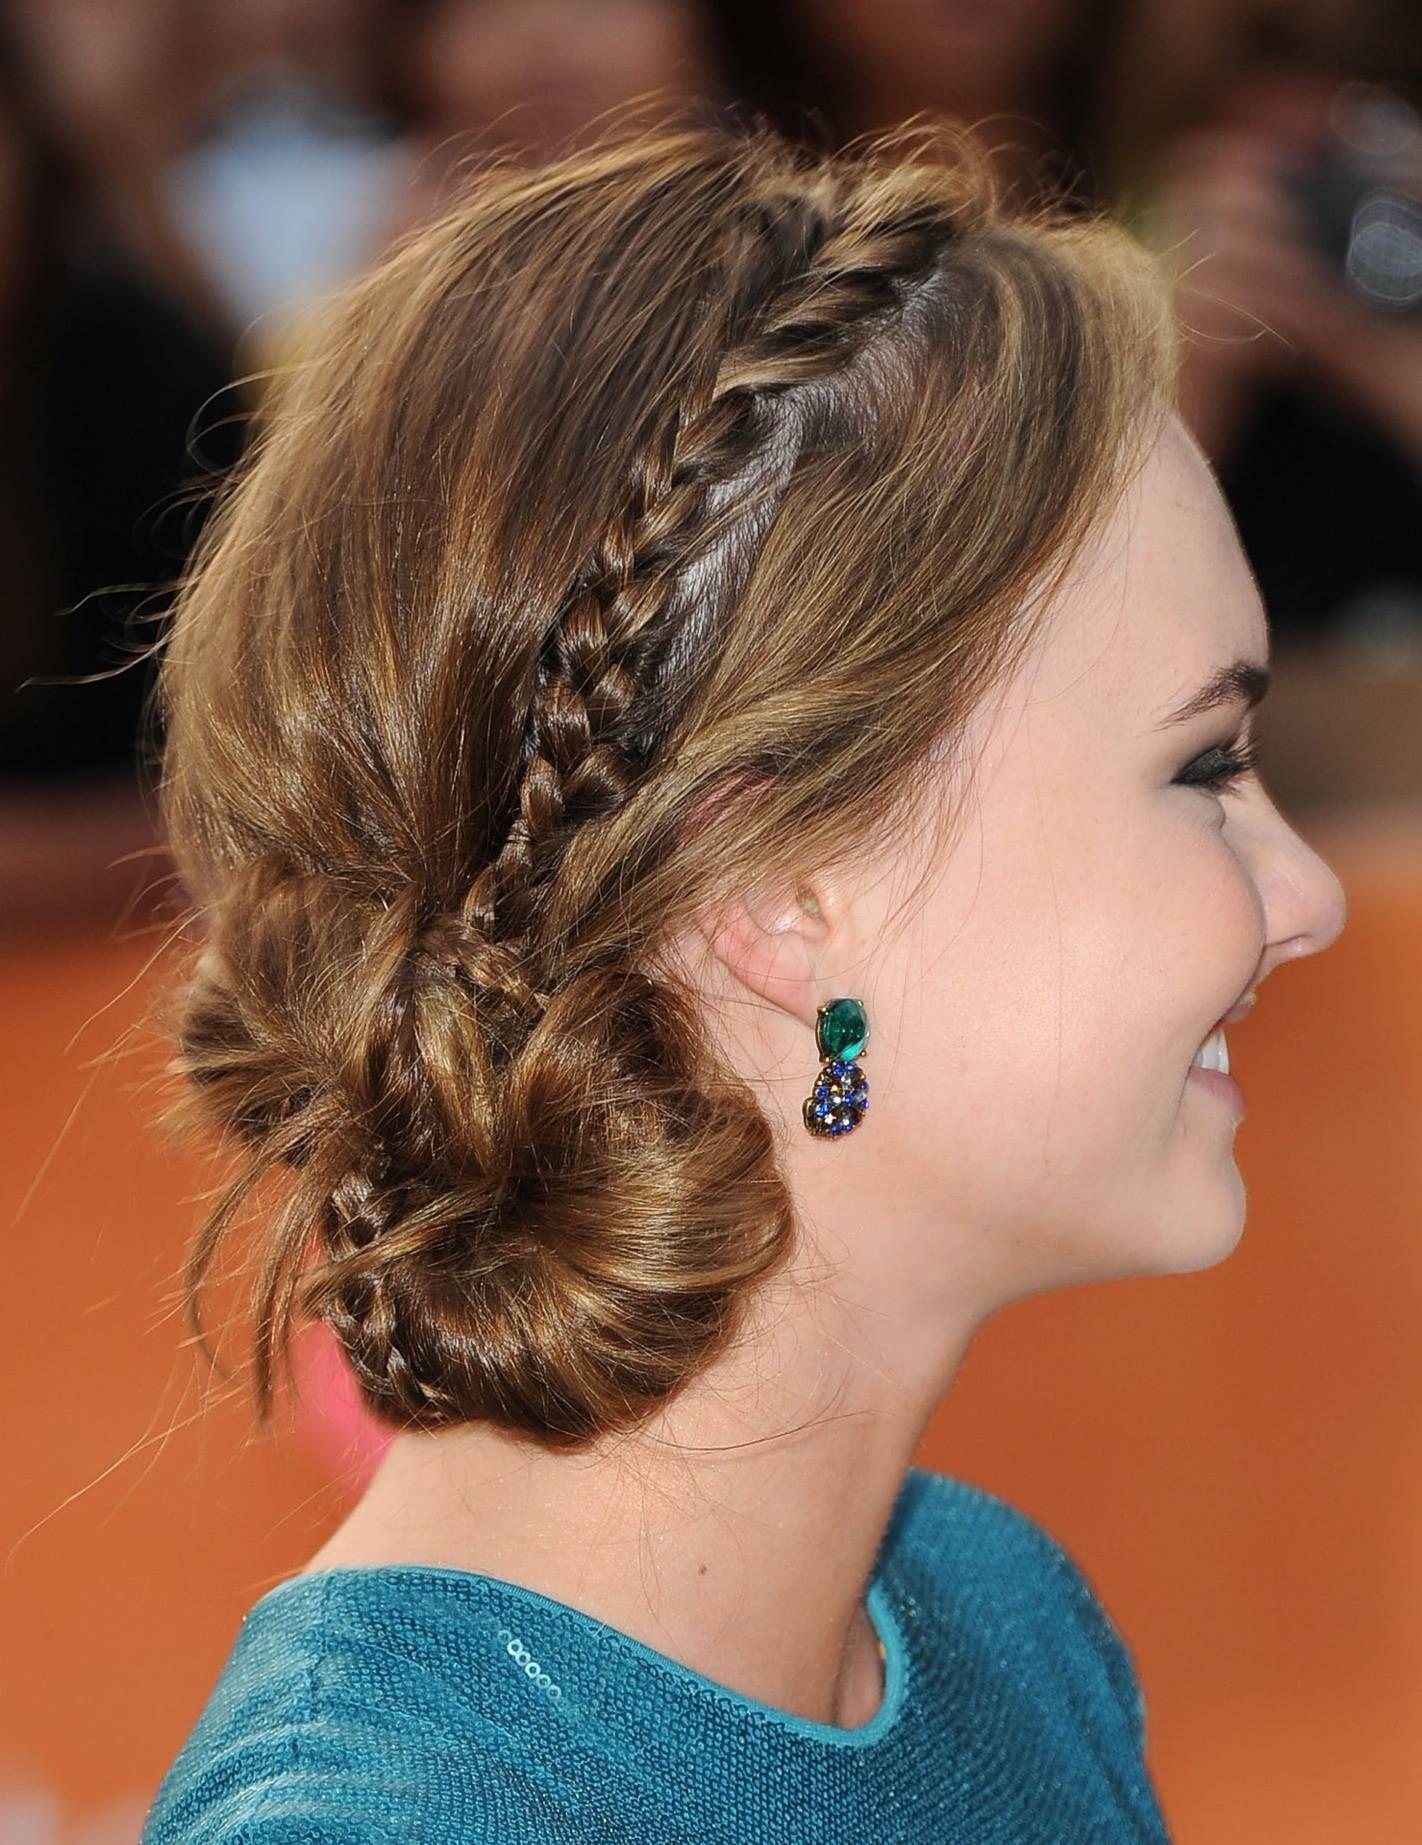 imagens sobre hair no pinterest brooklyn decker updo e bobs